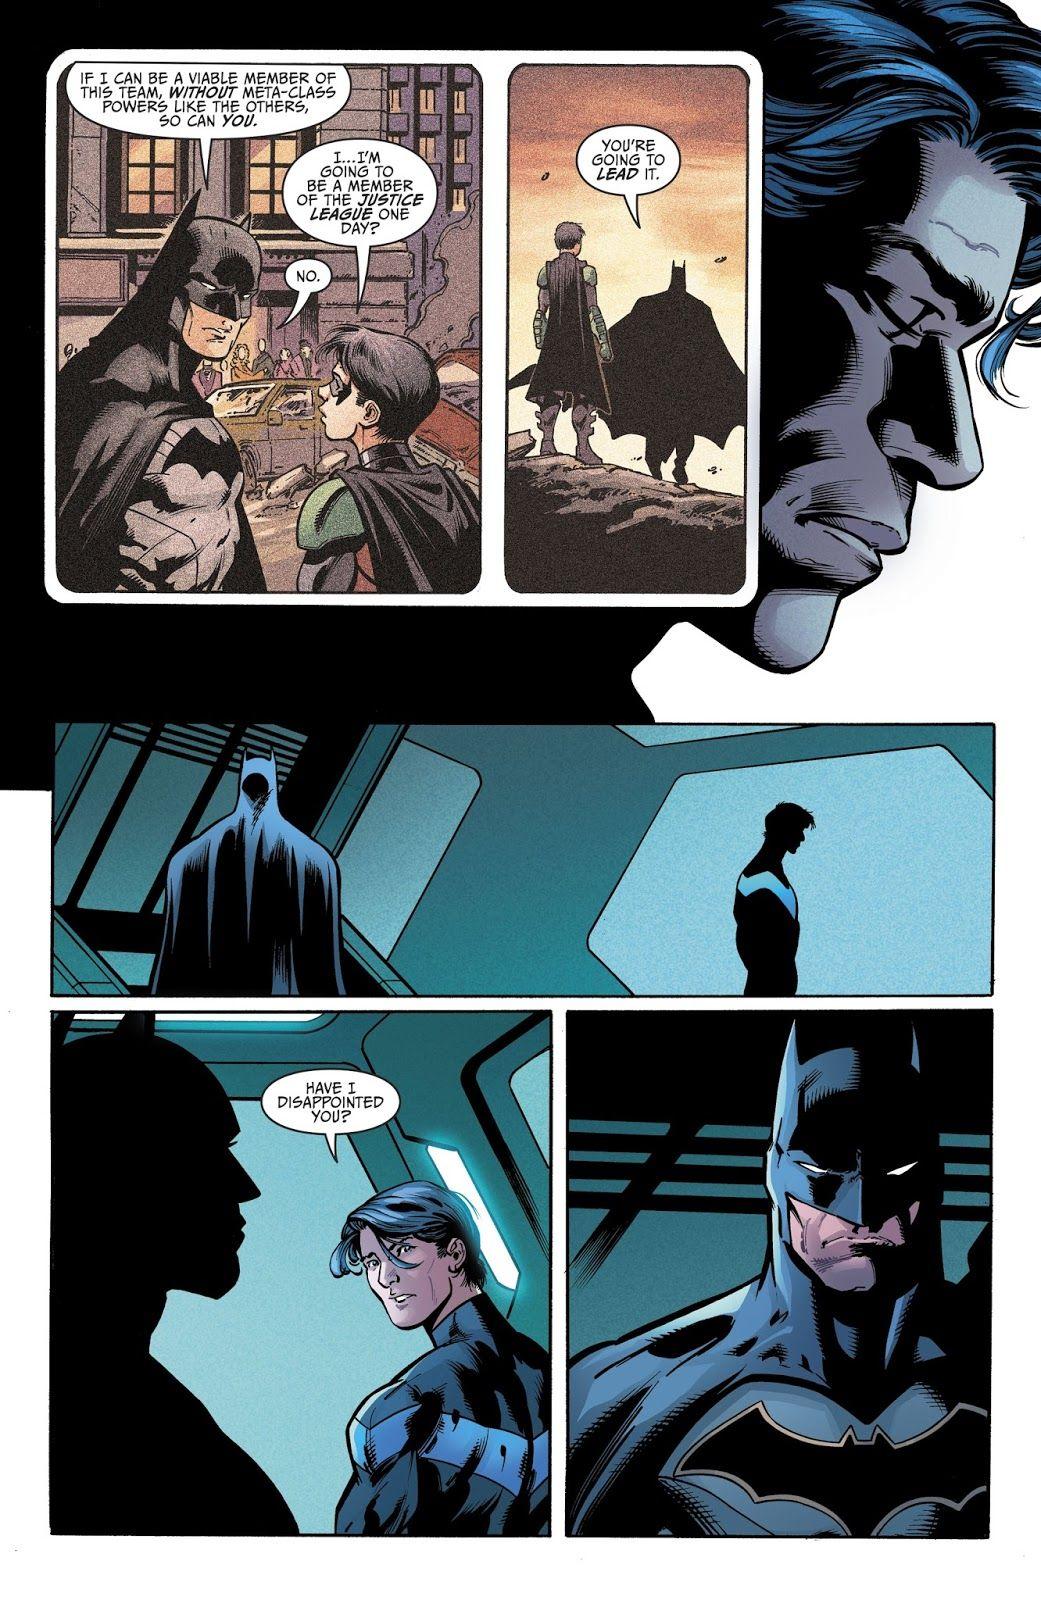 Titans 2016 Issue 19 Nightwing Cartoons Comics Batman